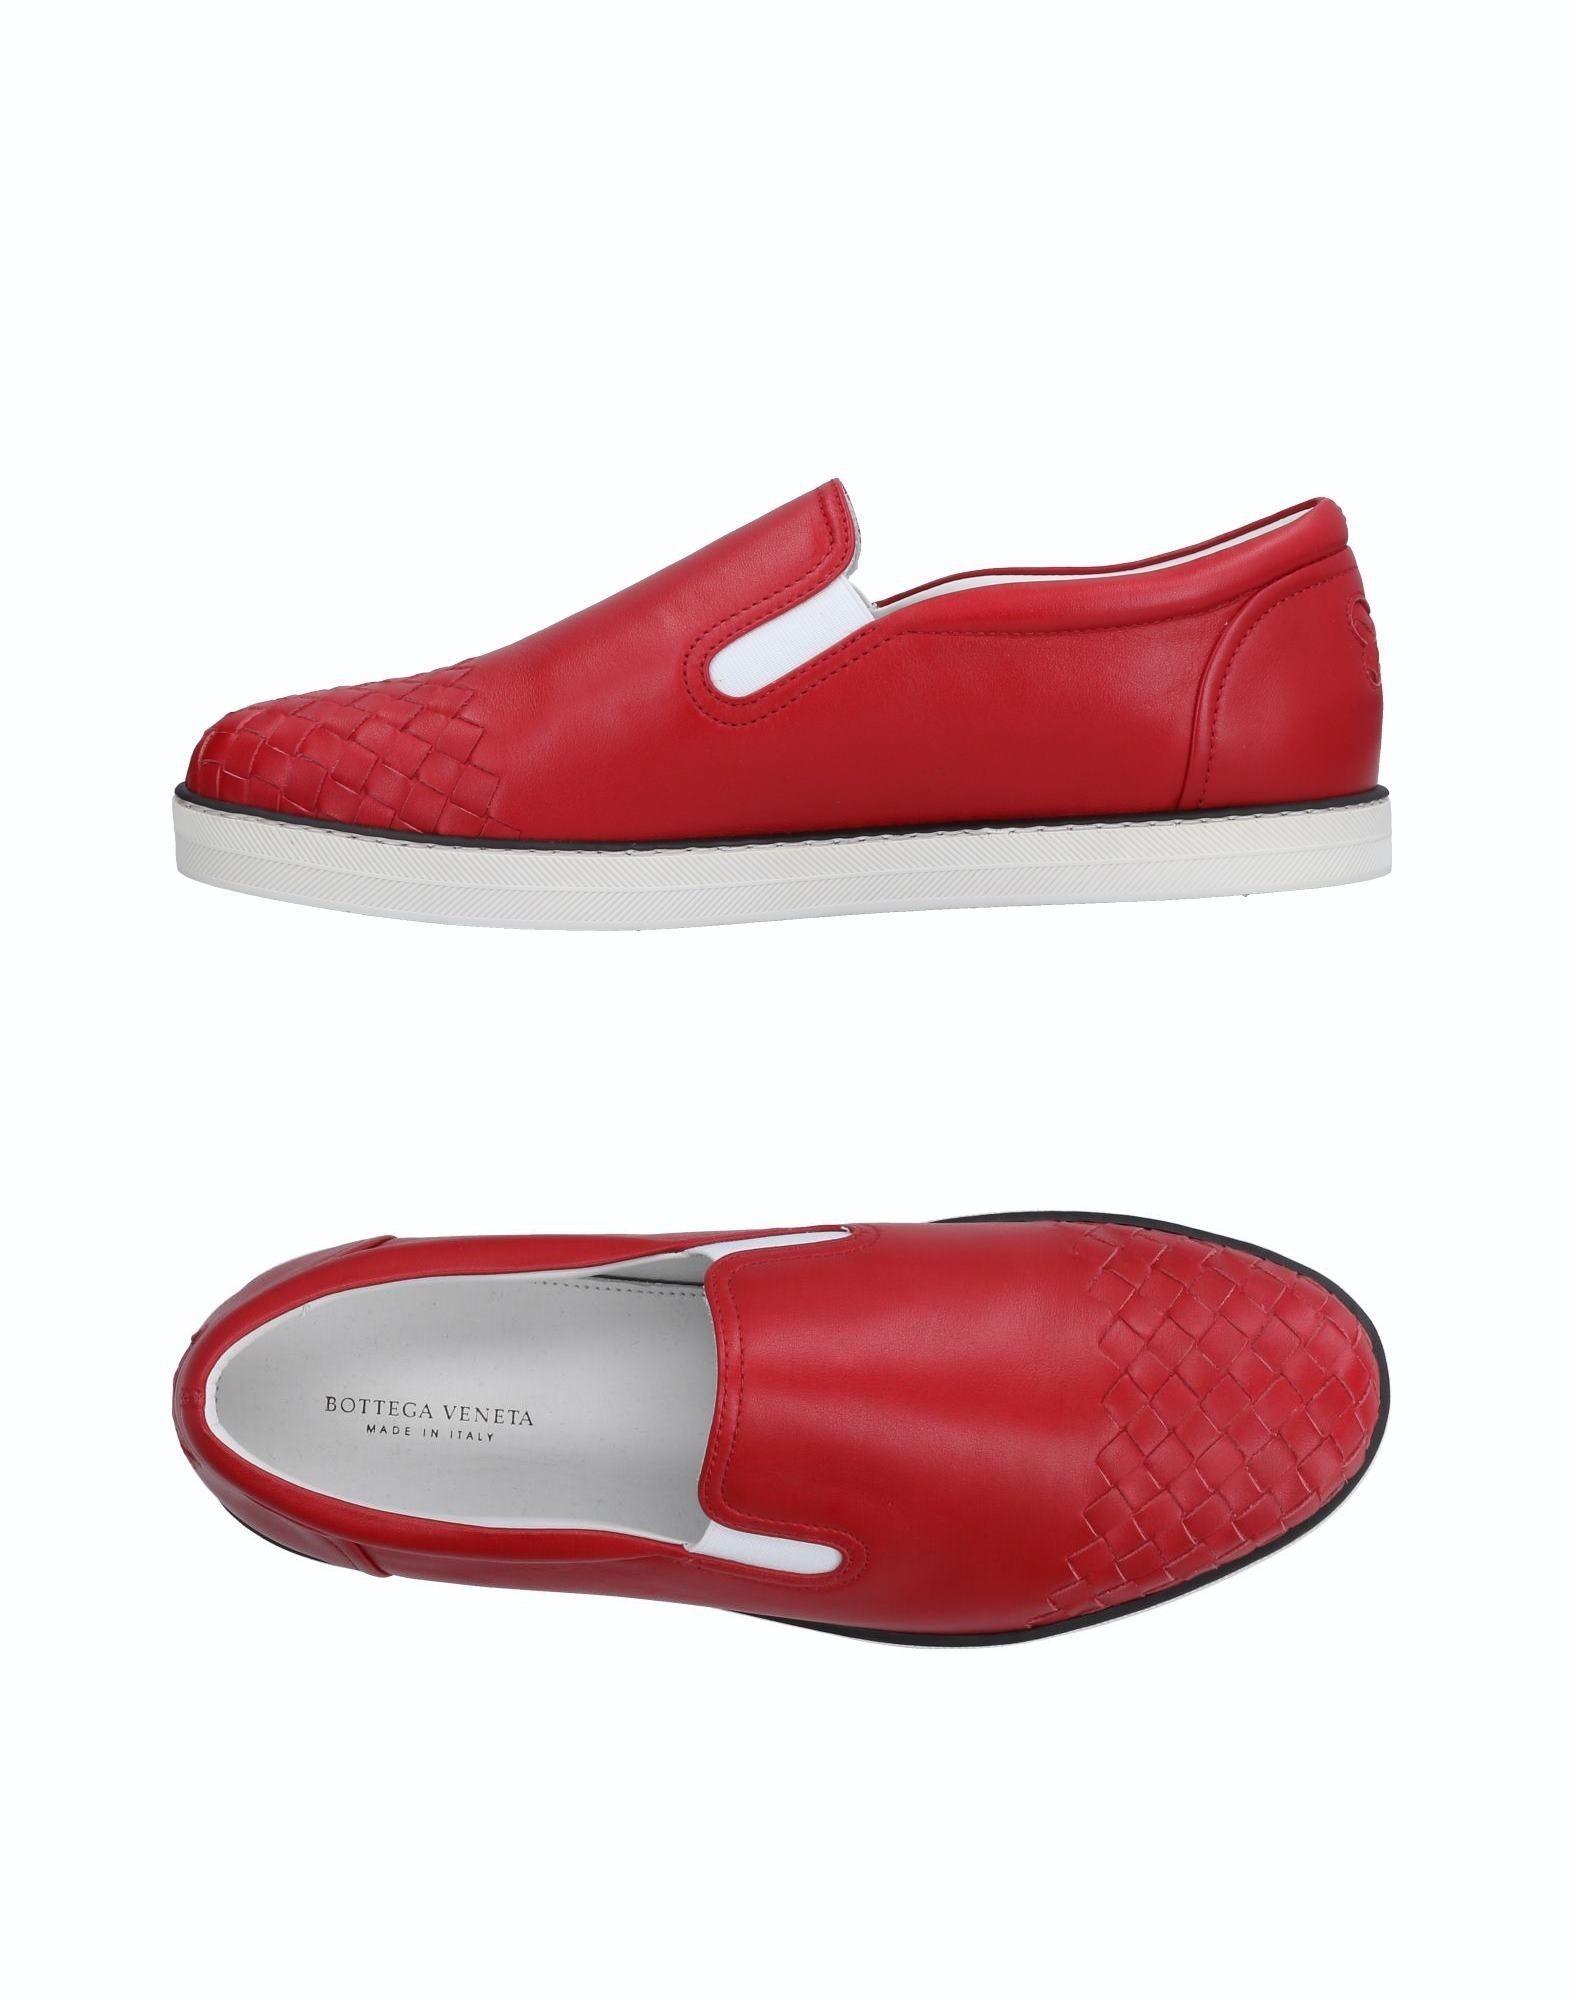 Bottega Veneta Sneakers Herren  11220903JT Gute Qualität beliebte Schuhe